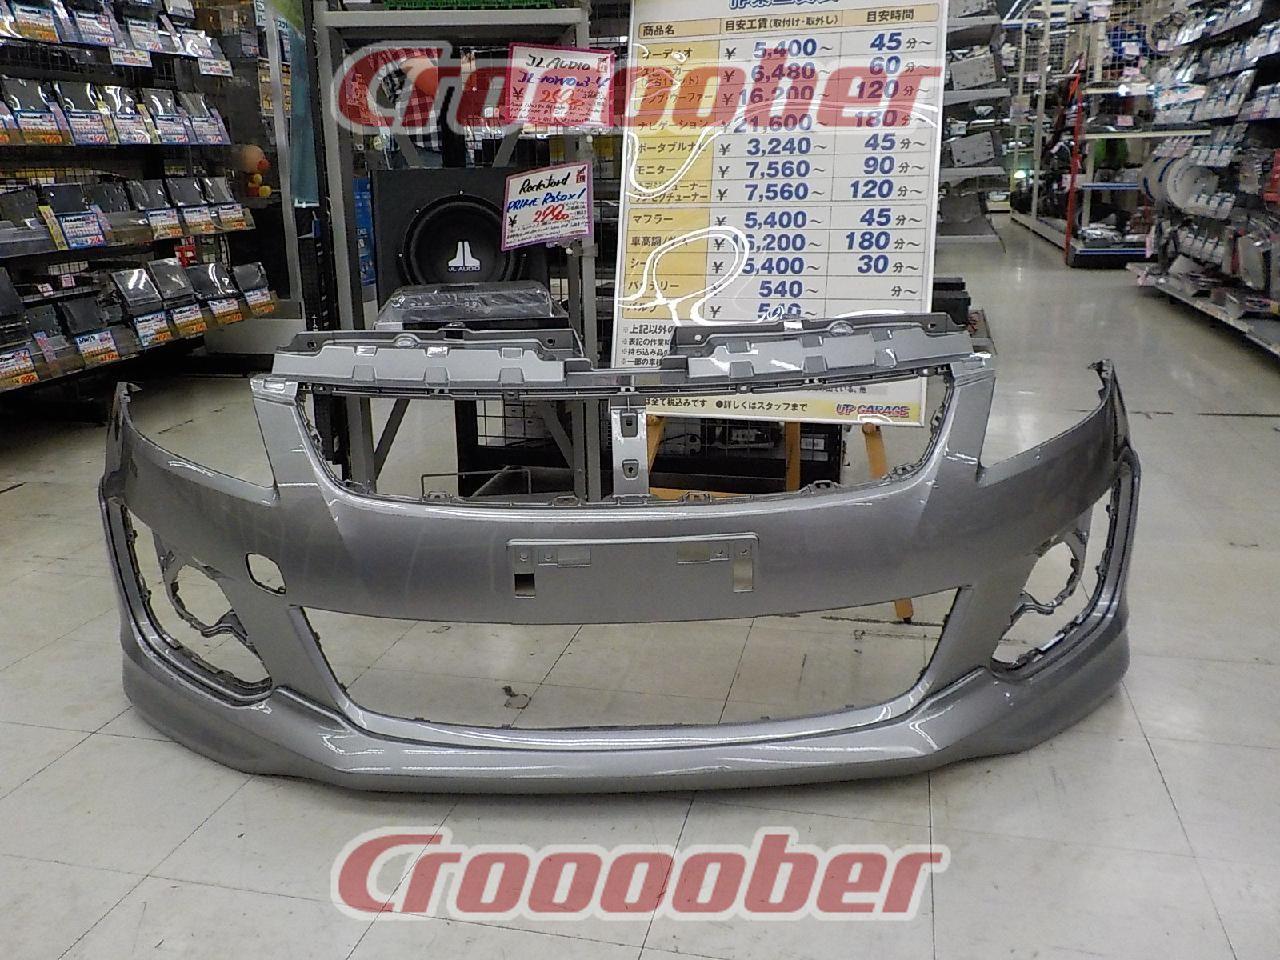 Suzuki Swift Genuine Front Bumper Front Body Kits Croooober